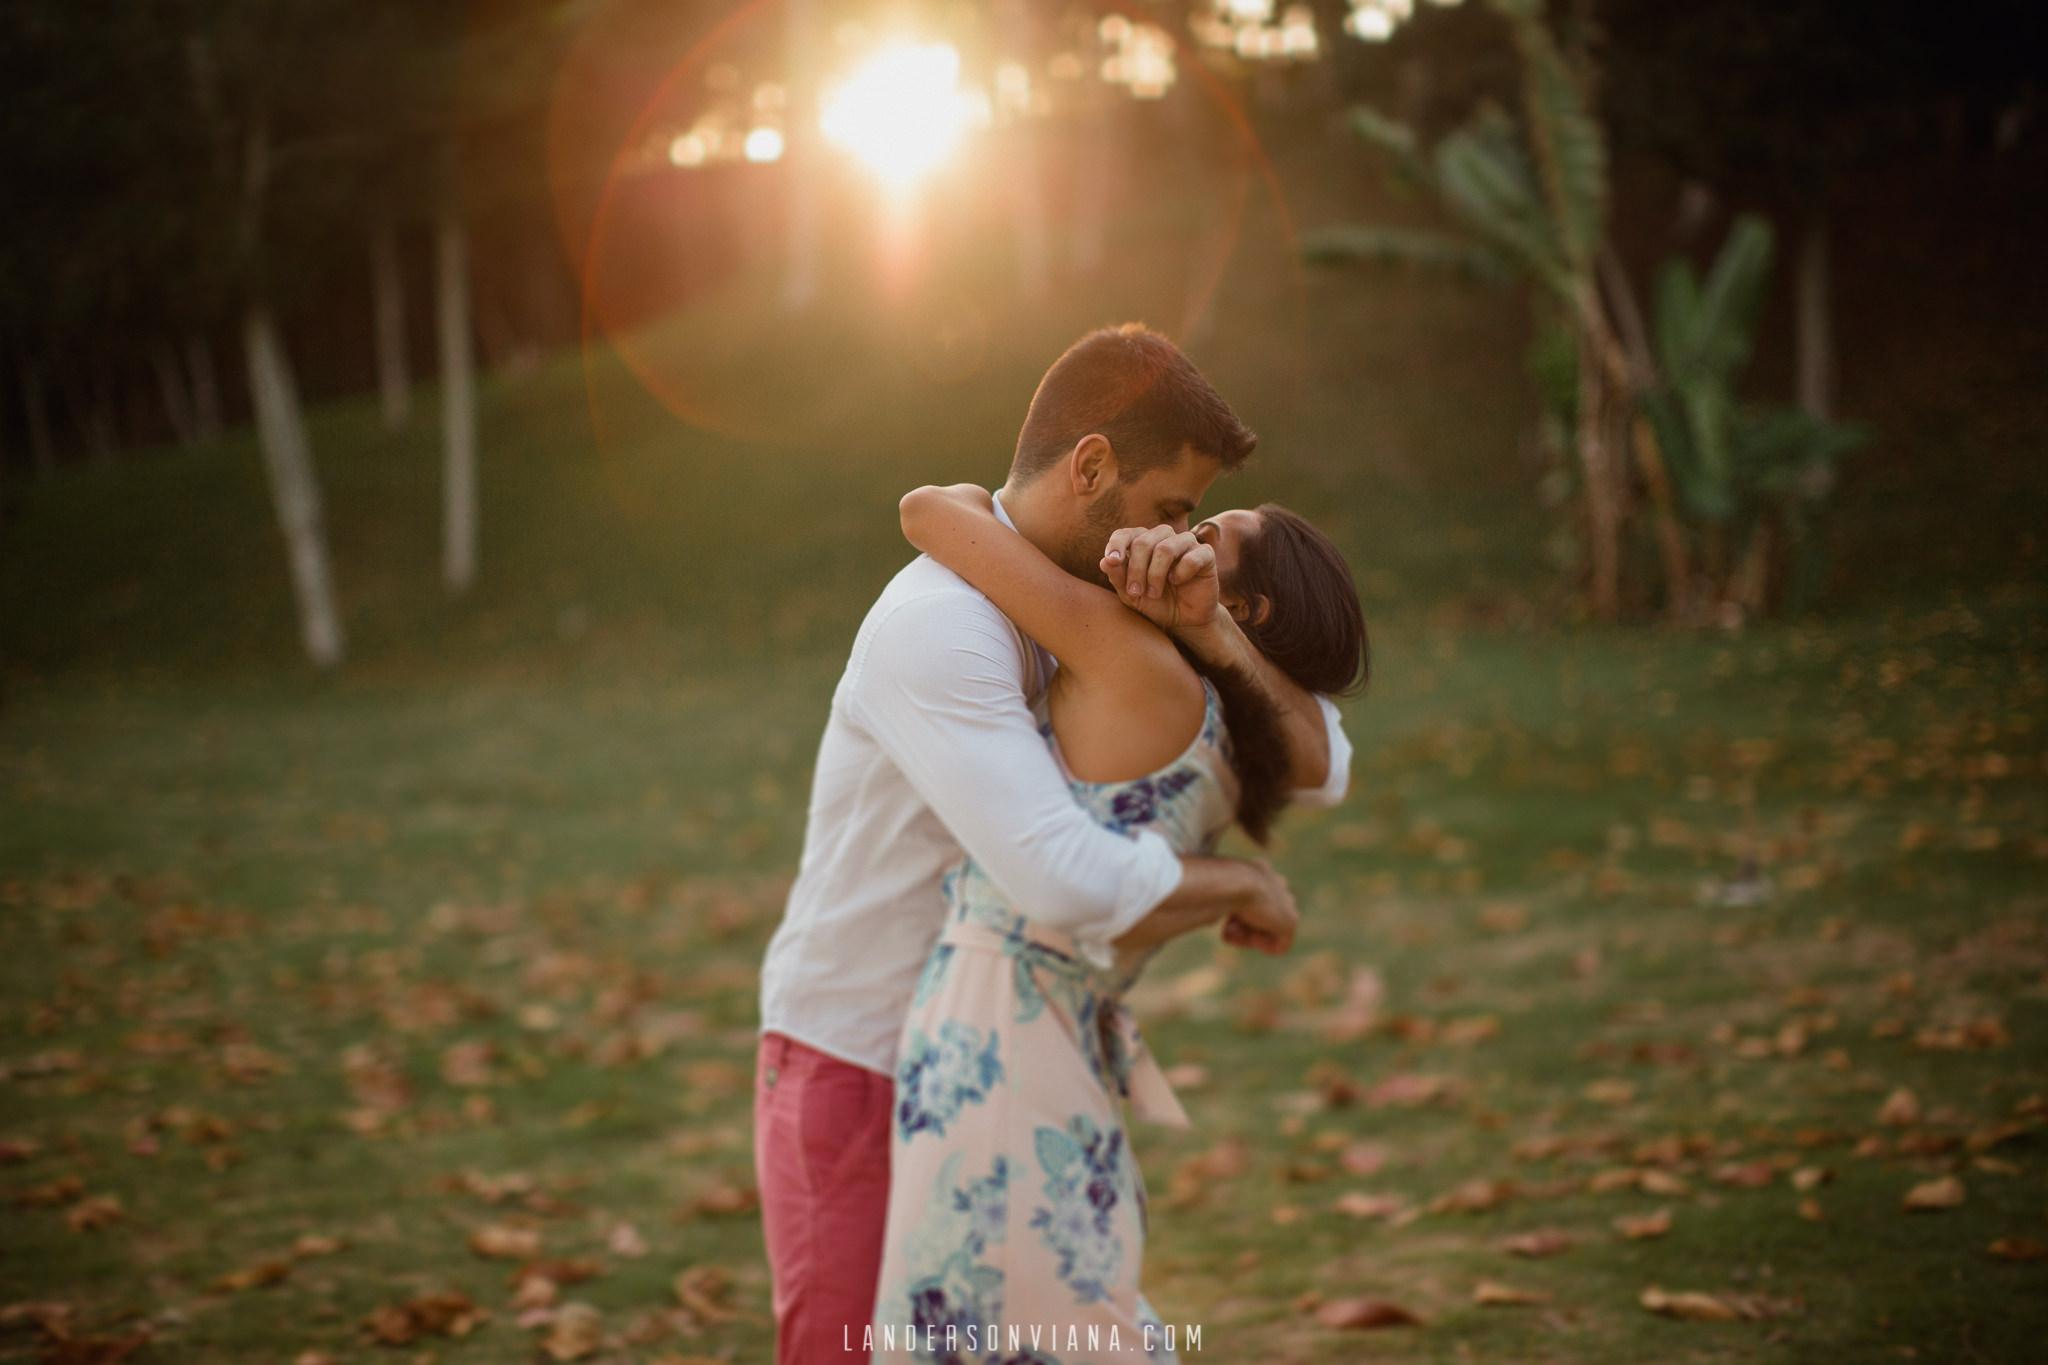 ensaio-pre-wedding-praia-landerson-viana-fotografia-casamento-pegueiobouquet-9.jpg